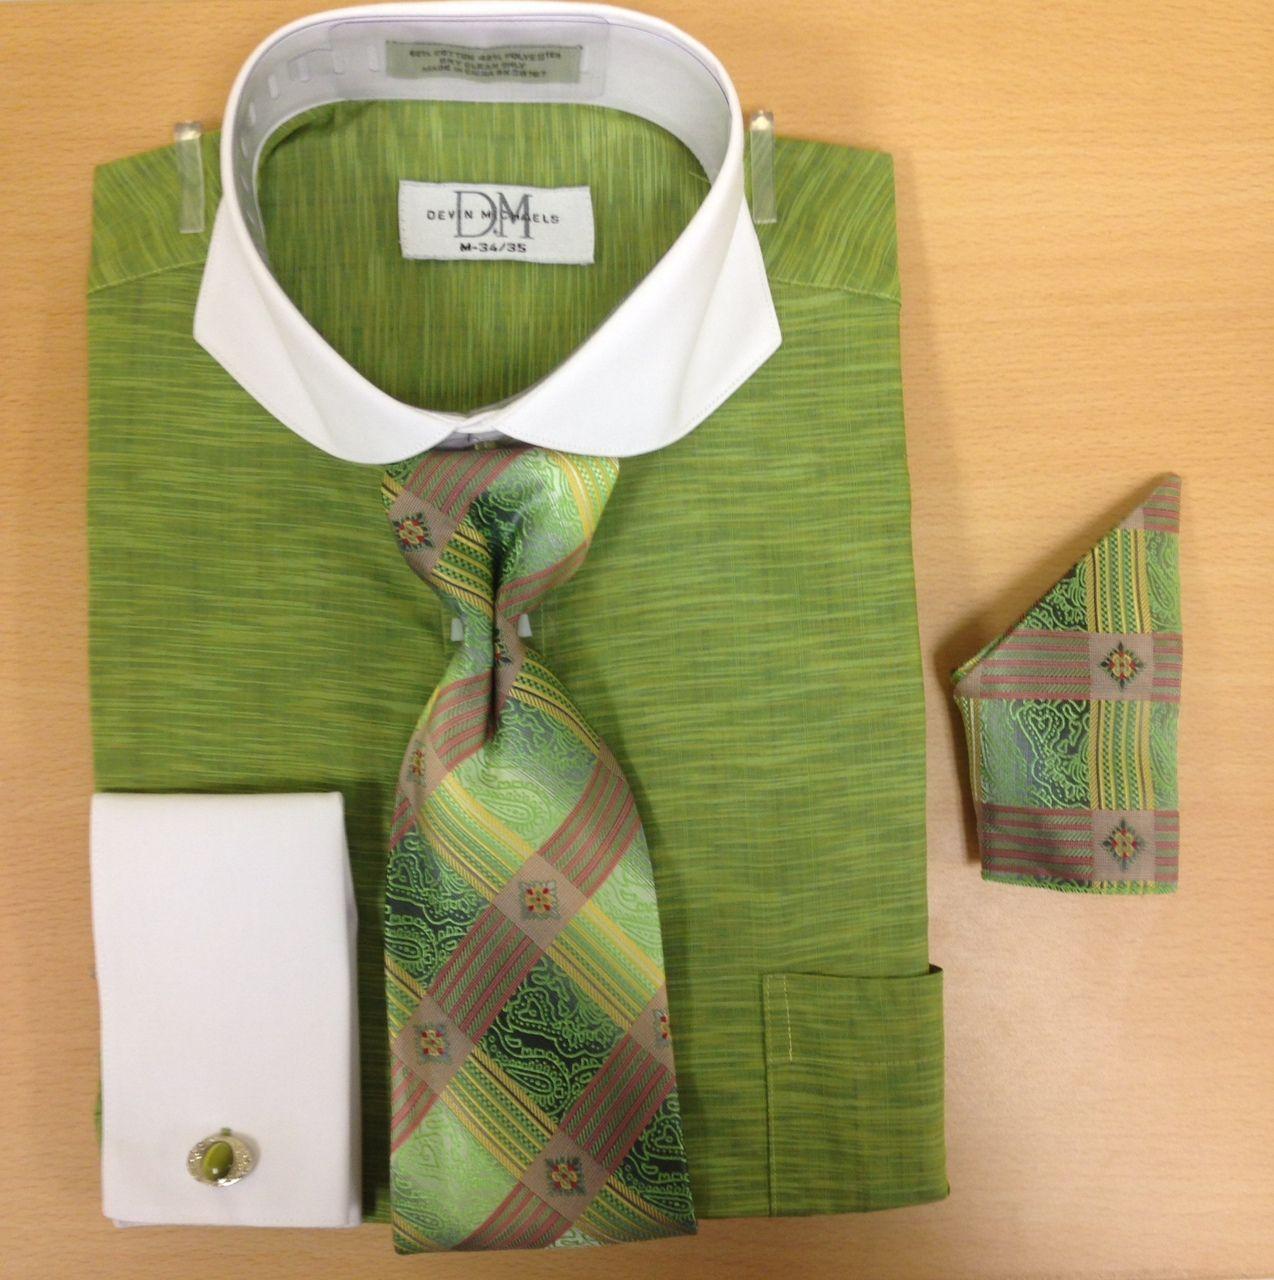 Men's Fashion Light Zigzag Pattern Cufflink Dress Shirt Set - Mint Green